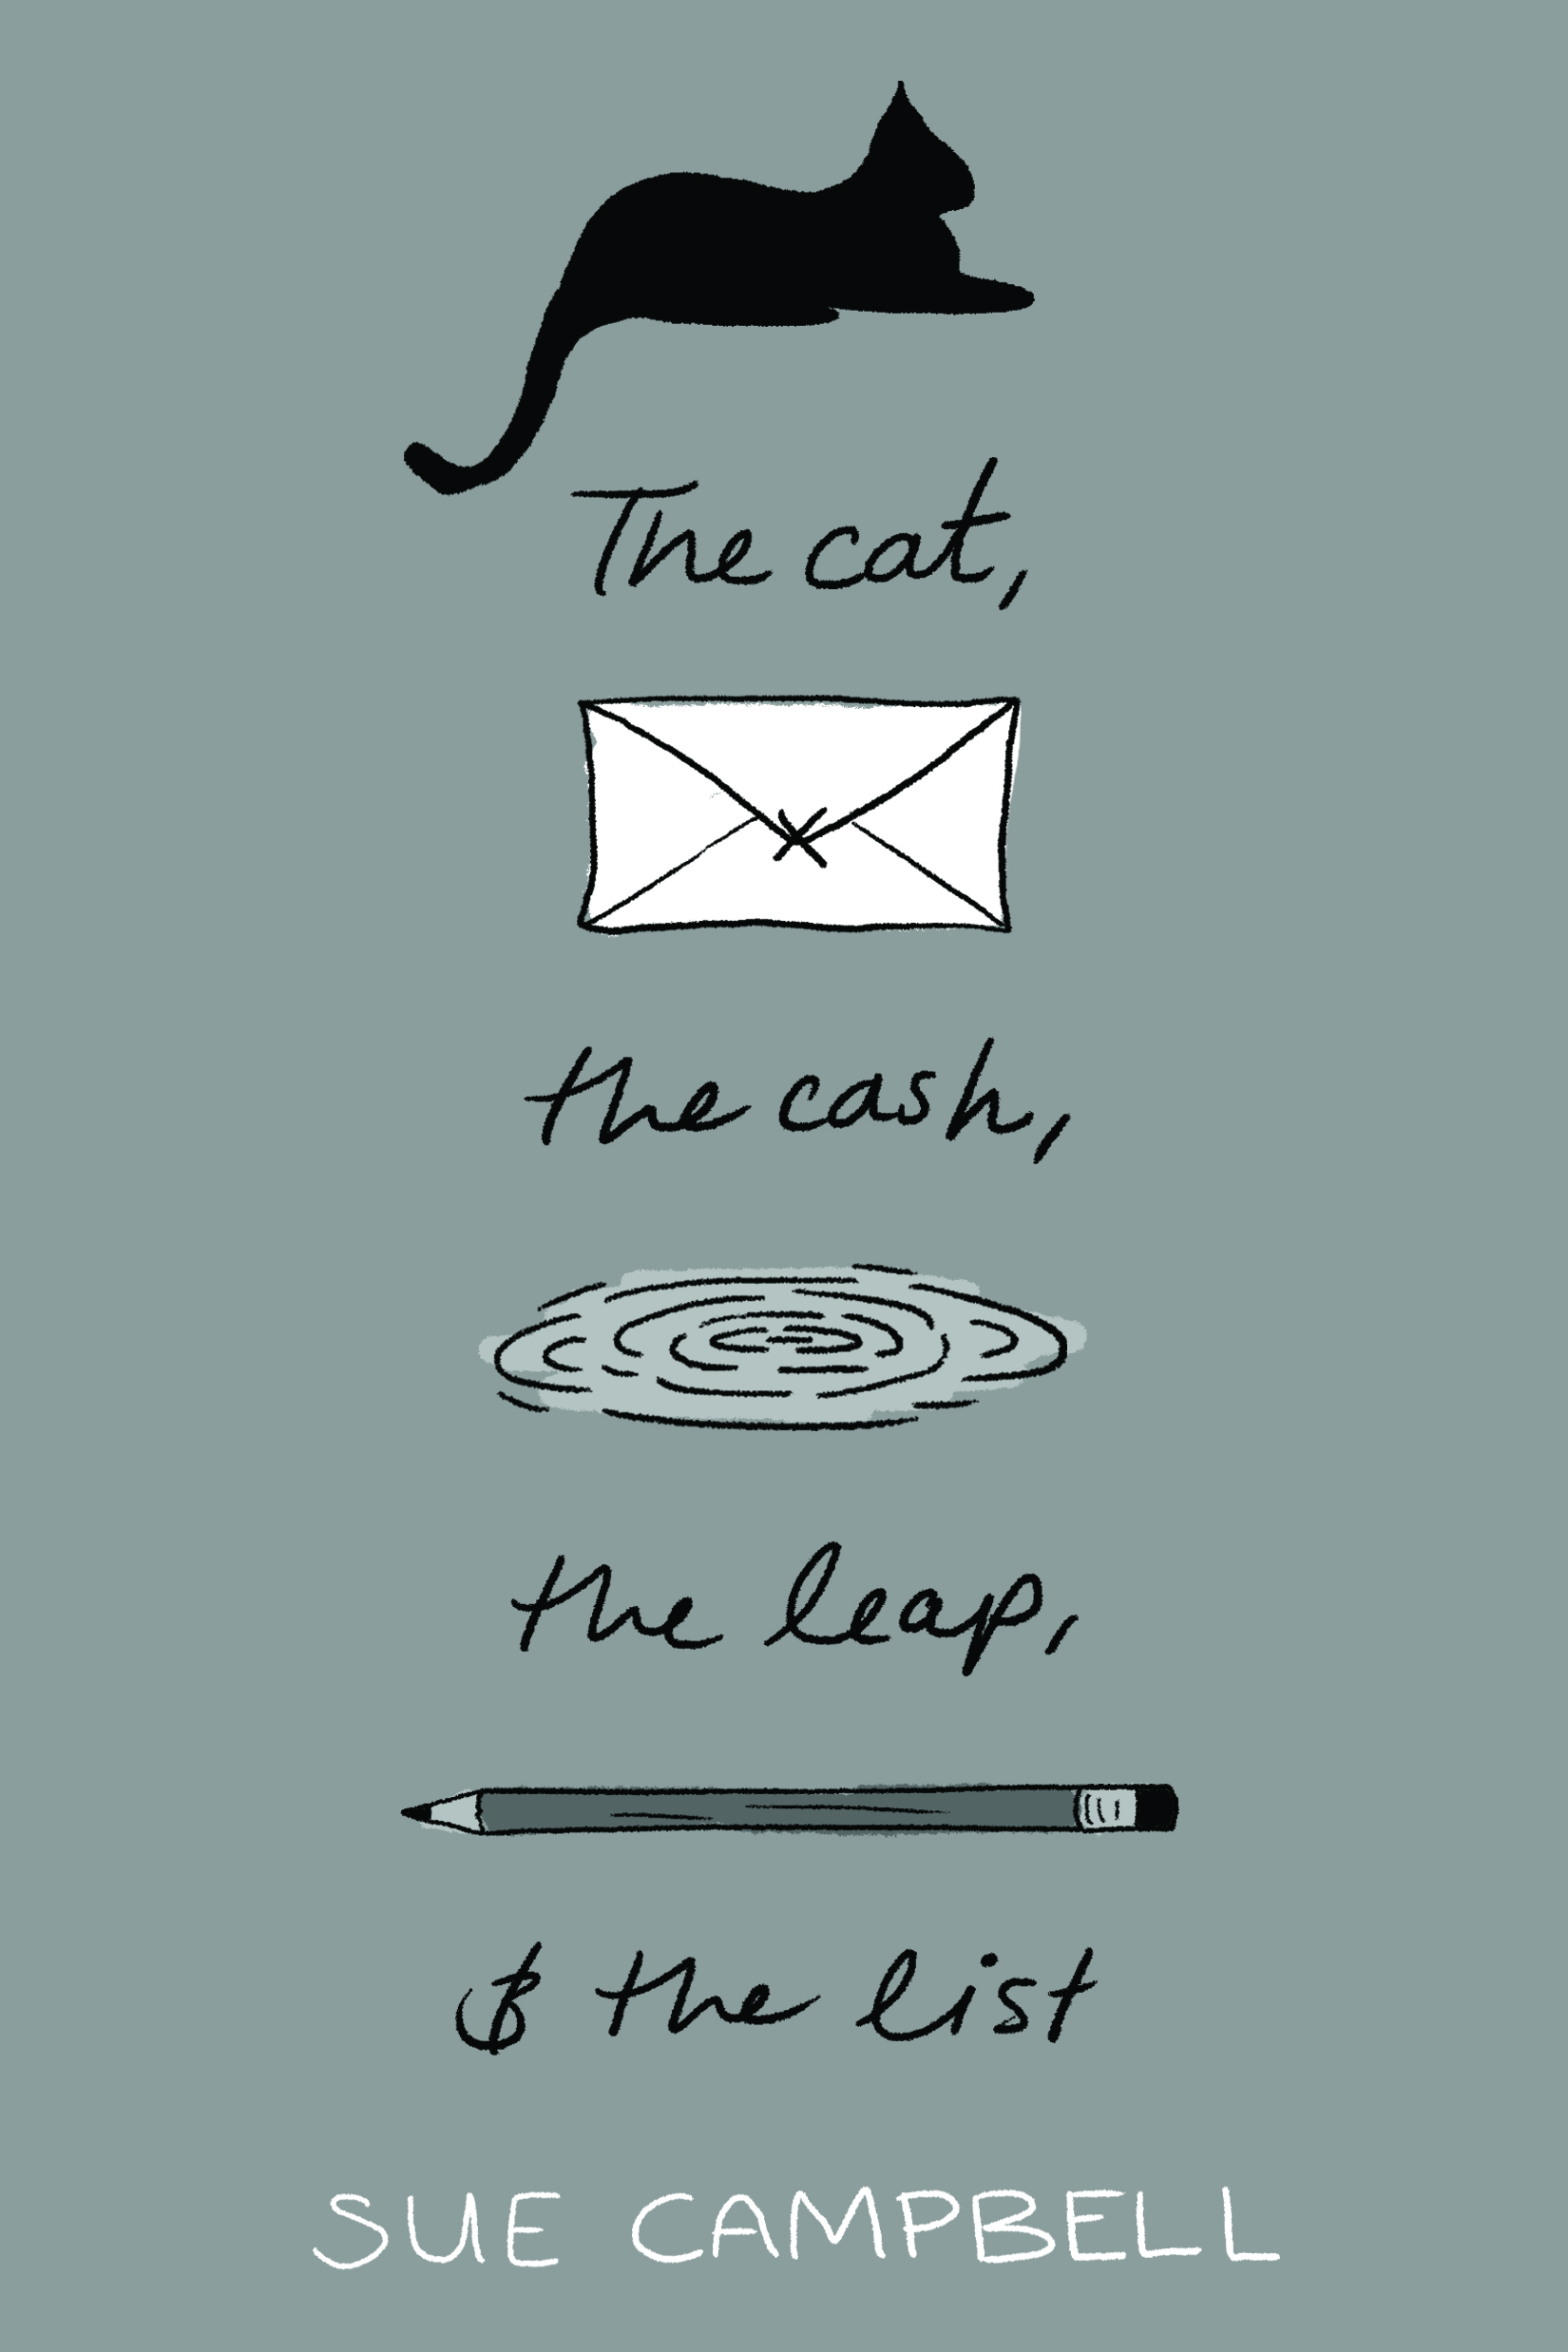 CatCash_Sketch1.jpg